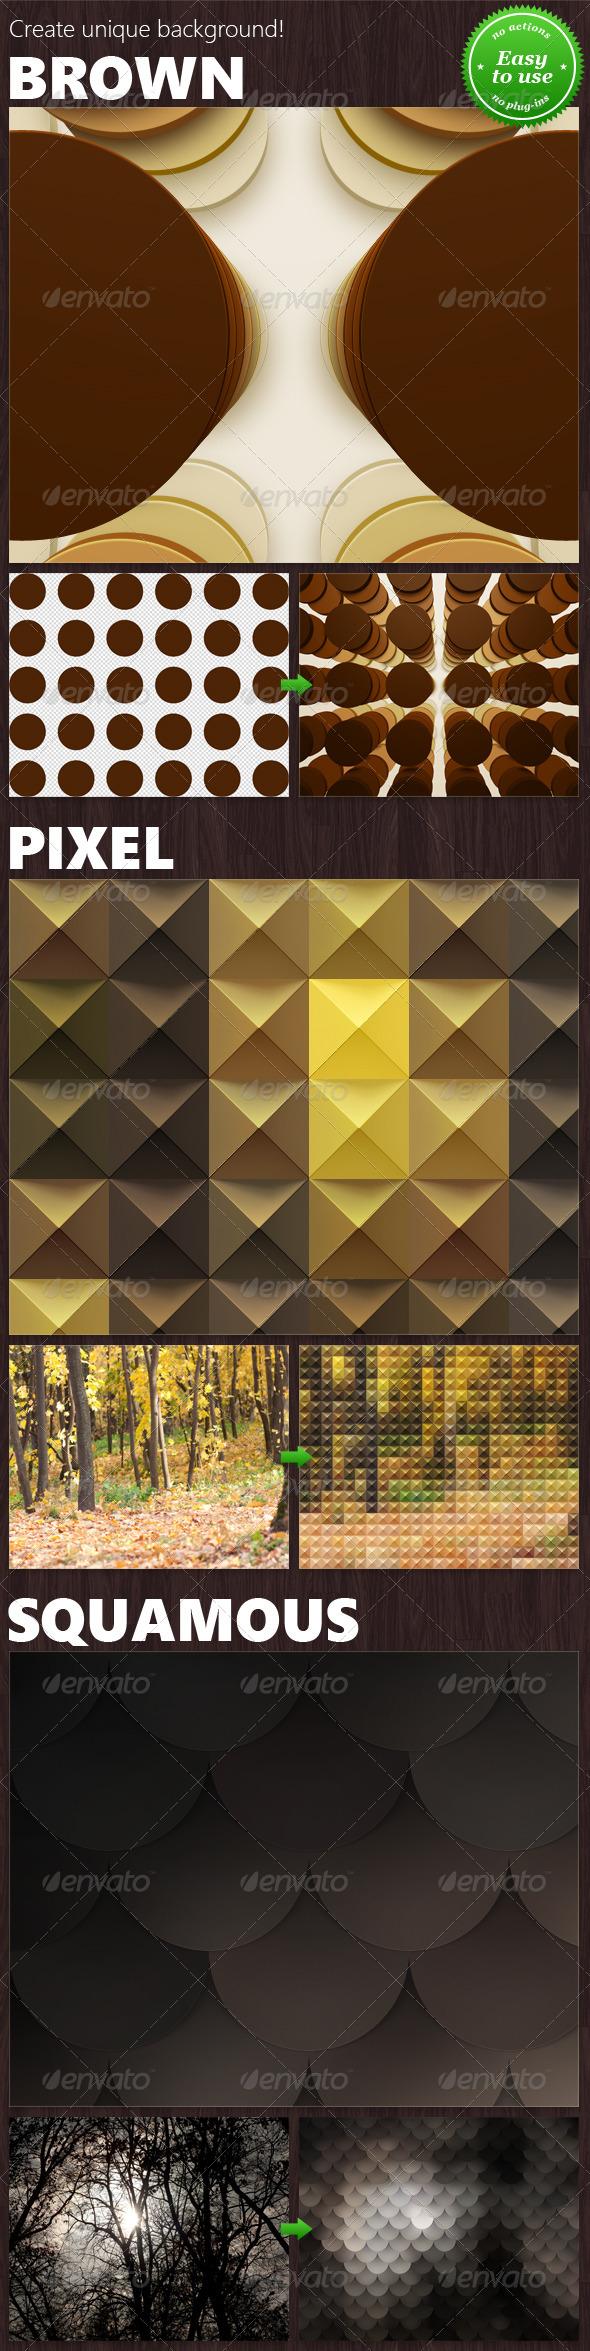 GraphicRiver Set of 3 Backgrounds Mockups 8755409